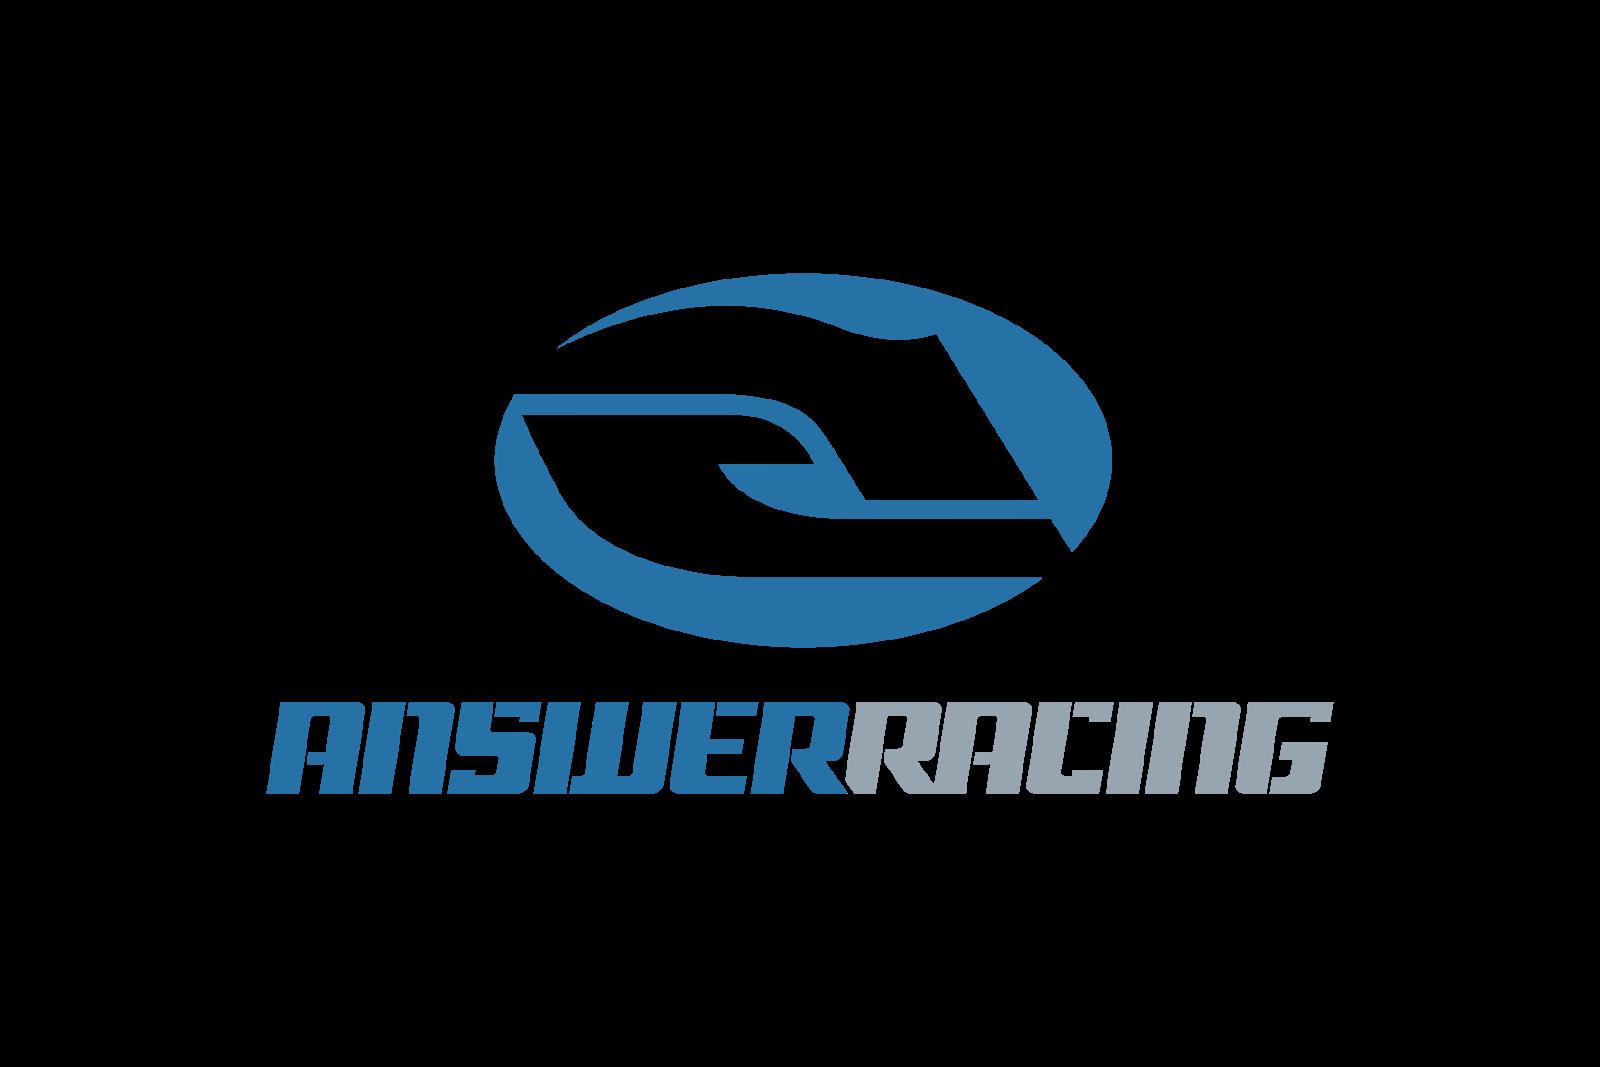 Logo Answer Racing PNG - 108704